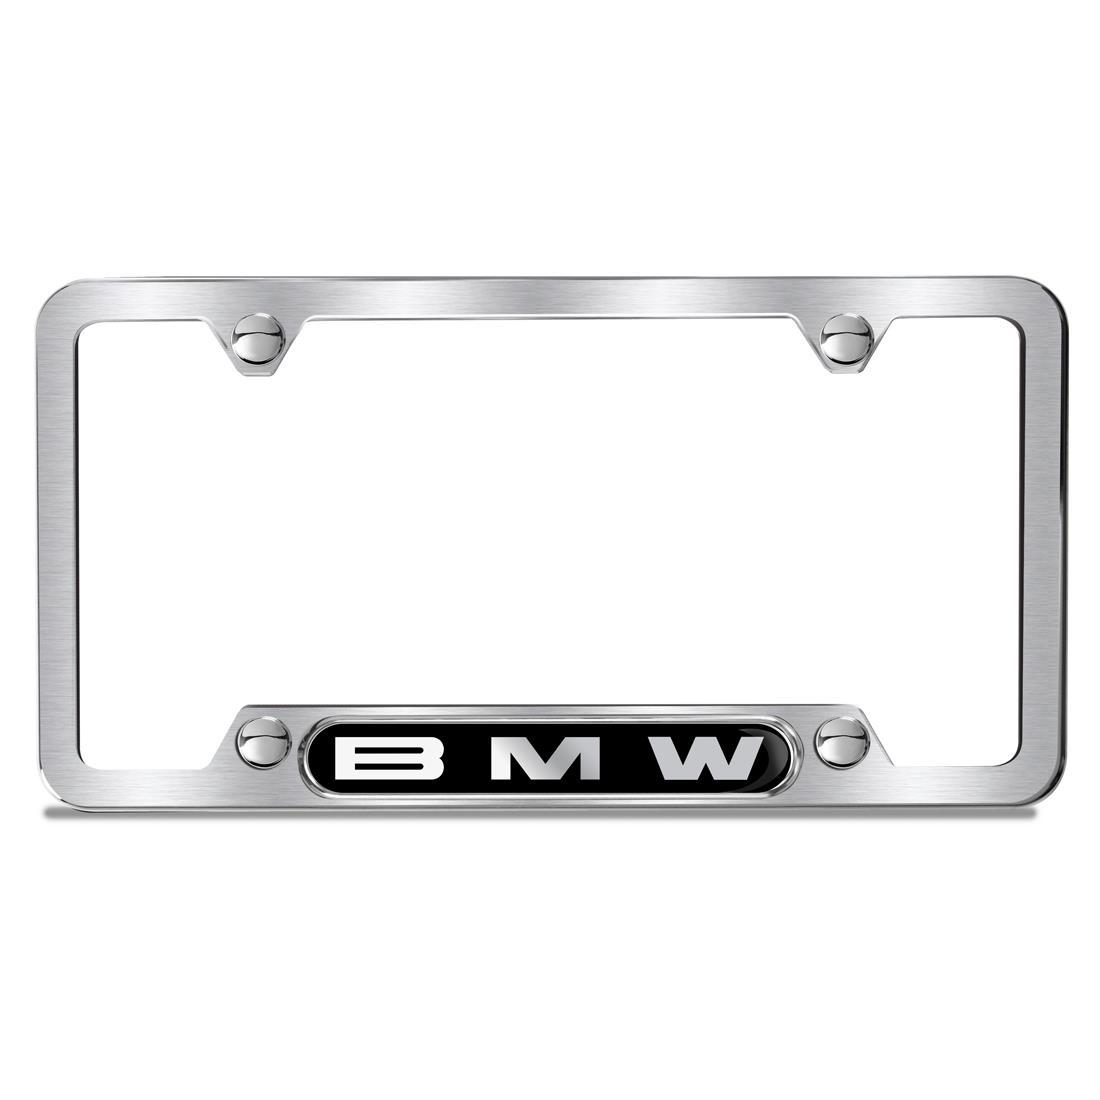 BMW Brushed BMW Lettering Plate Frame, Silver